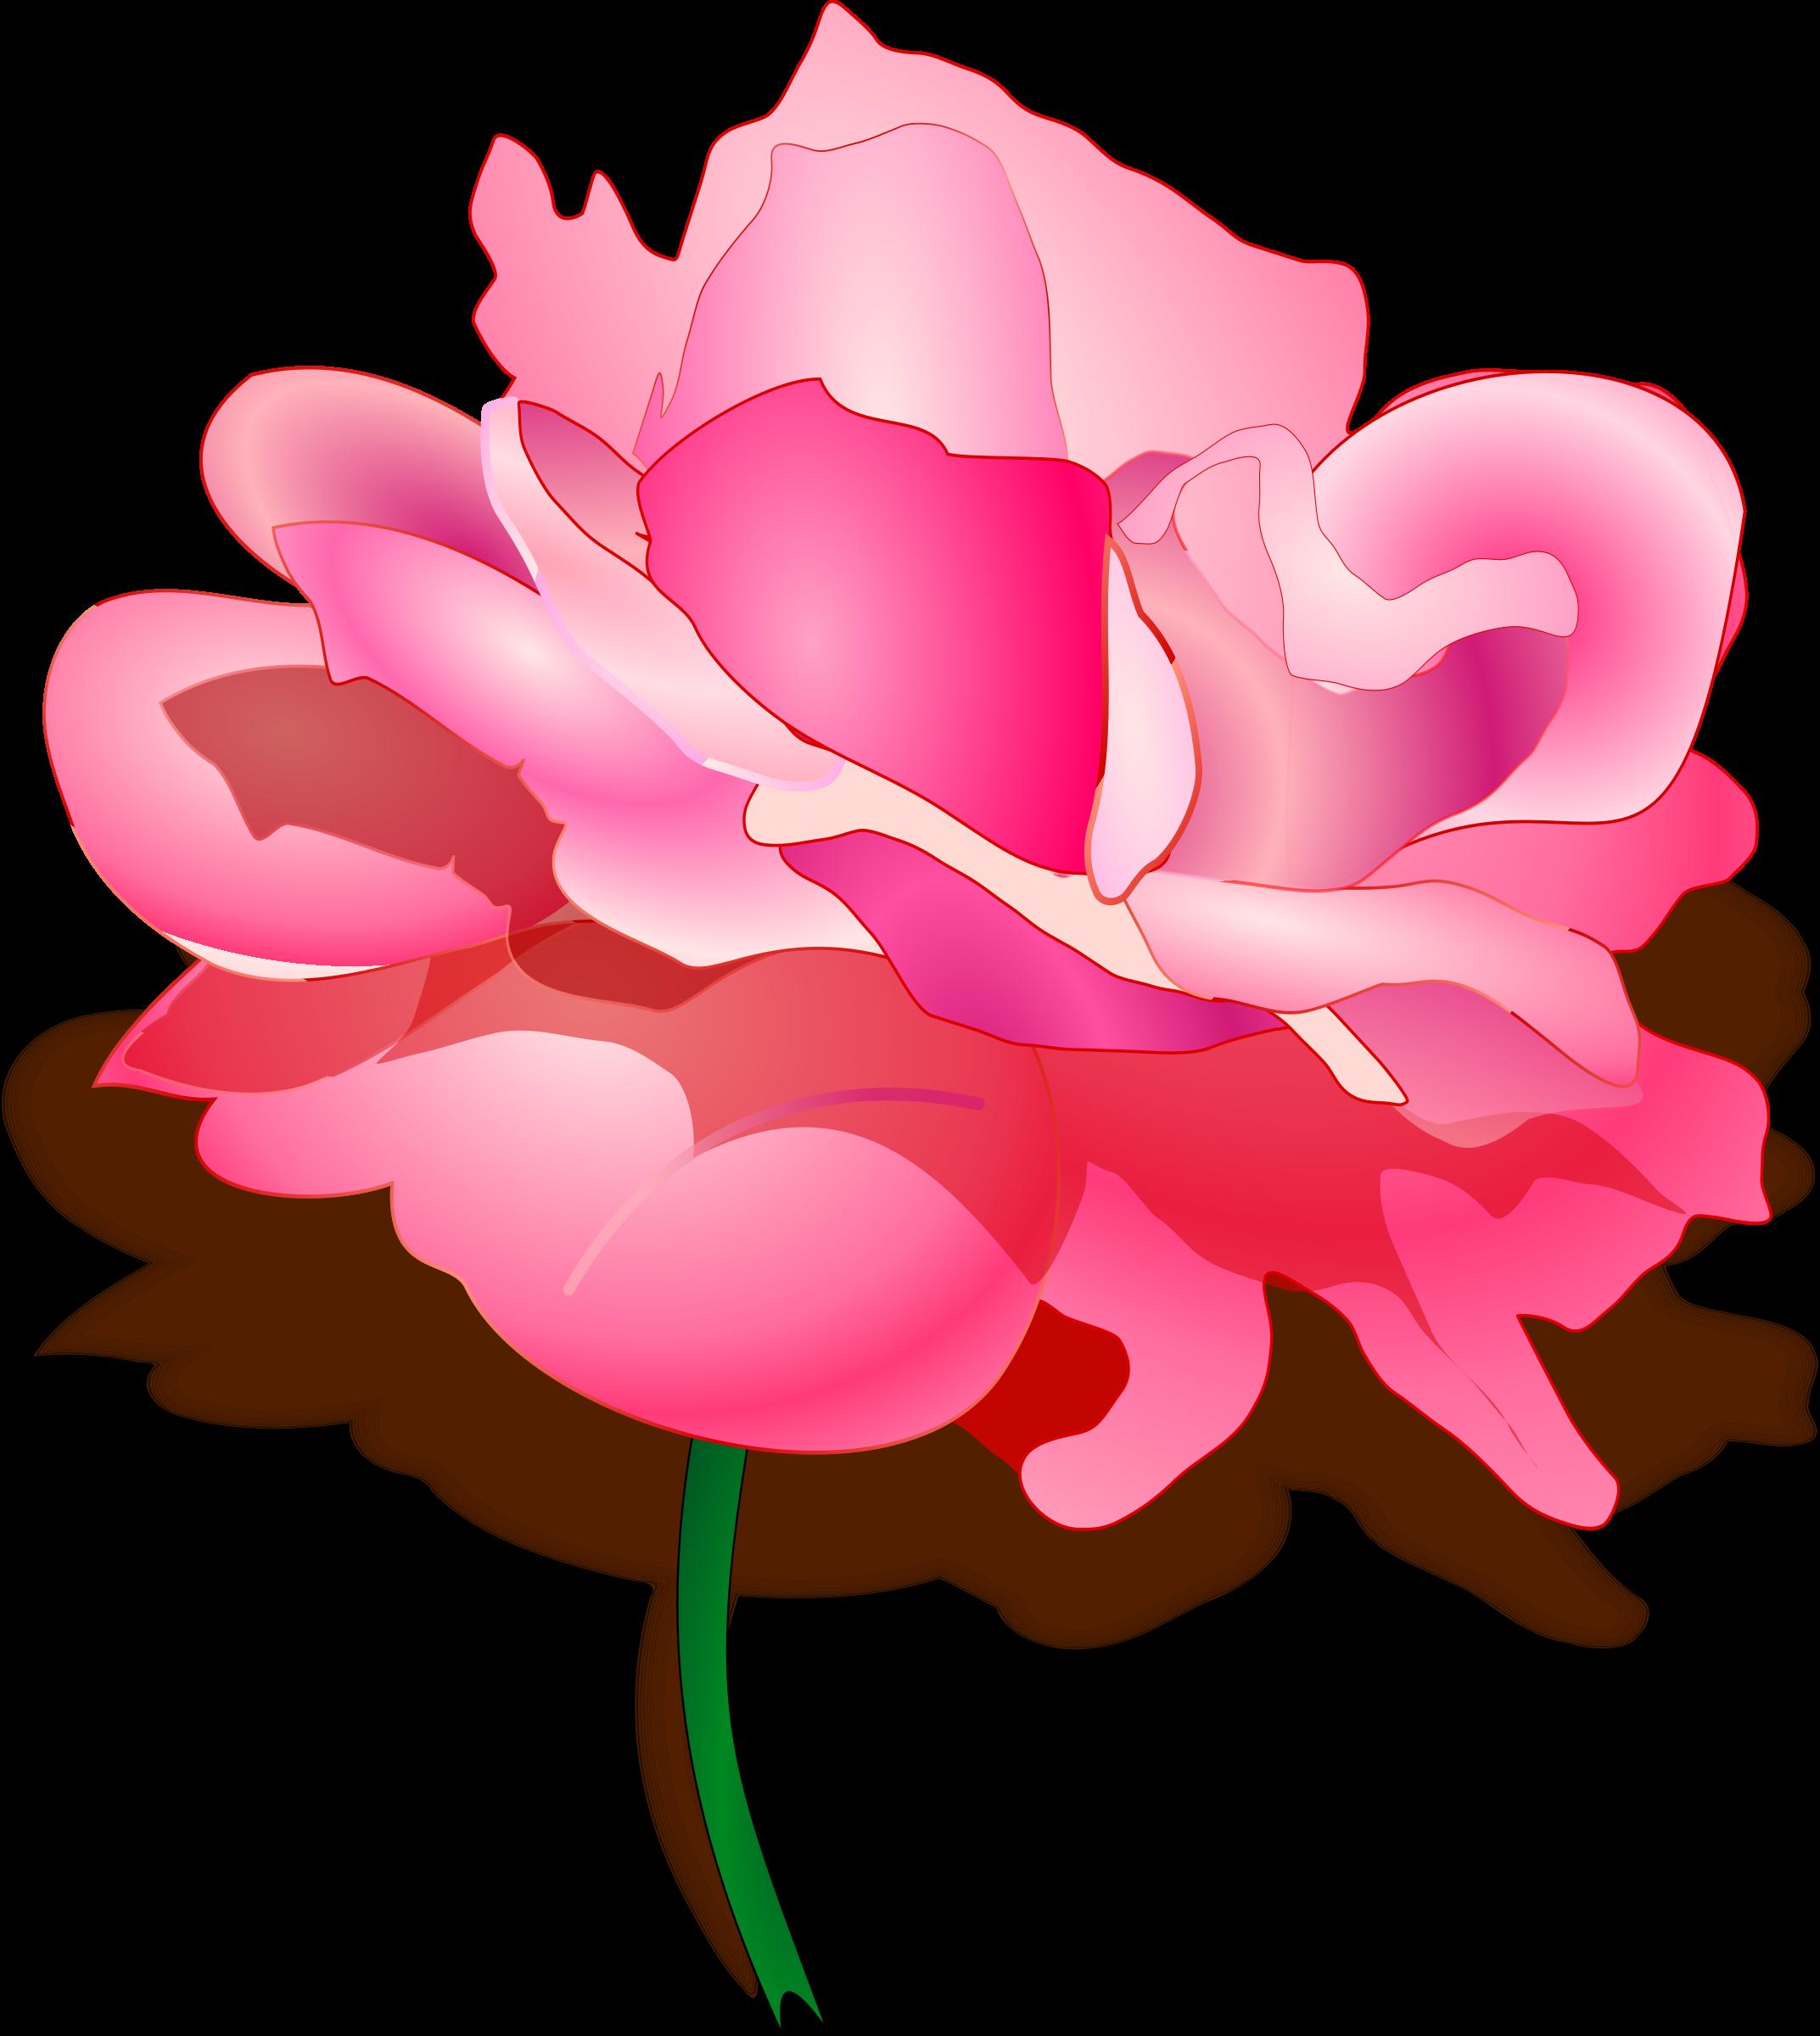 image transparent download Rose big image png. Peony clipart illustrated